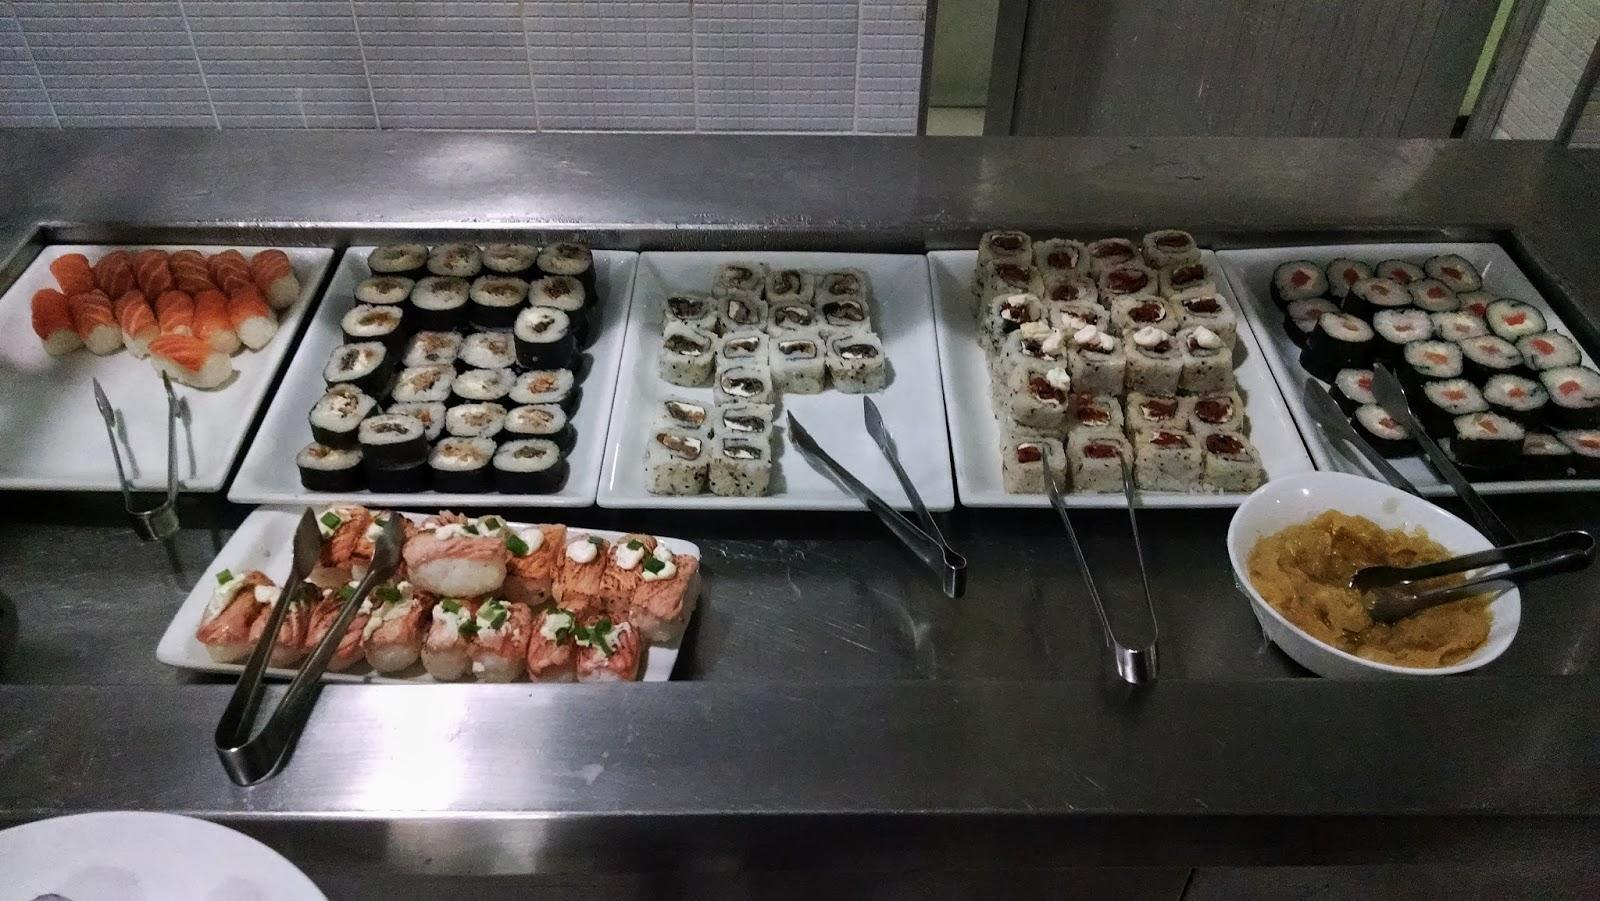 rodizio sushi fortaleza, rodizio fortaleza, rodizio sushi fortaleza, rodizio fortaleza,